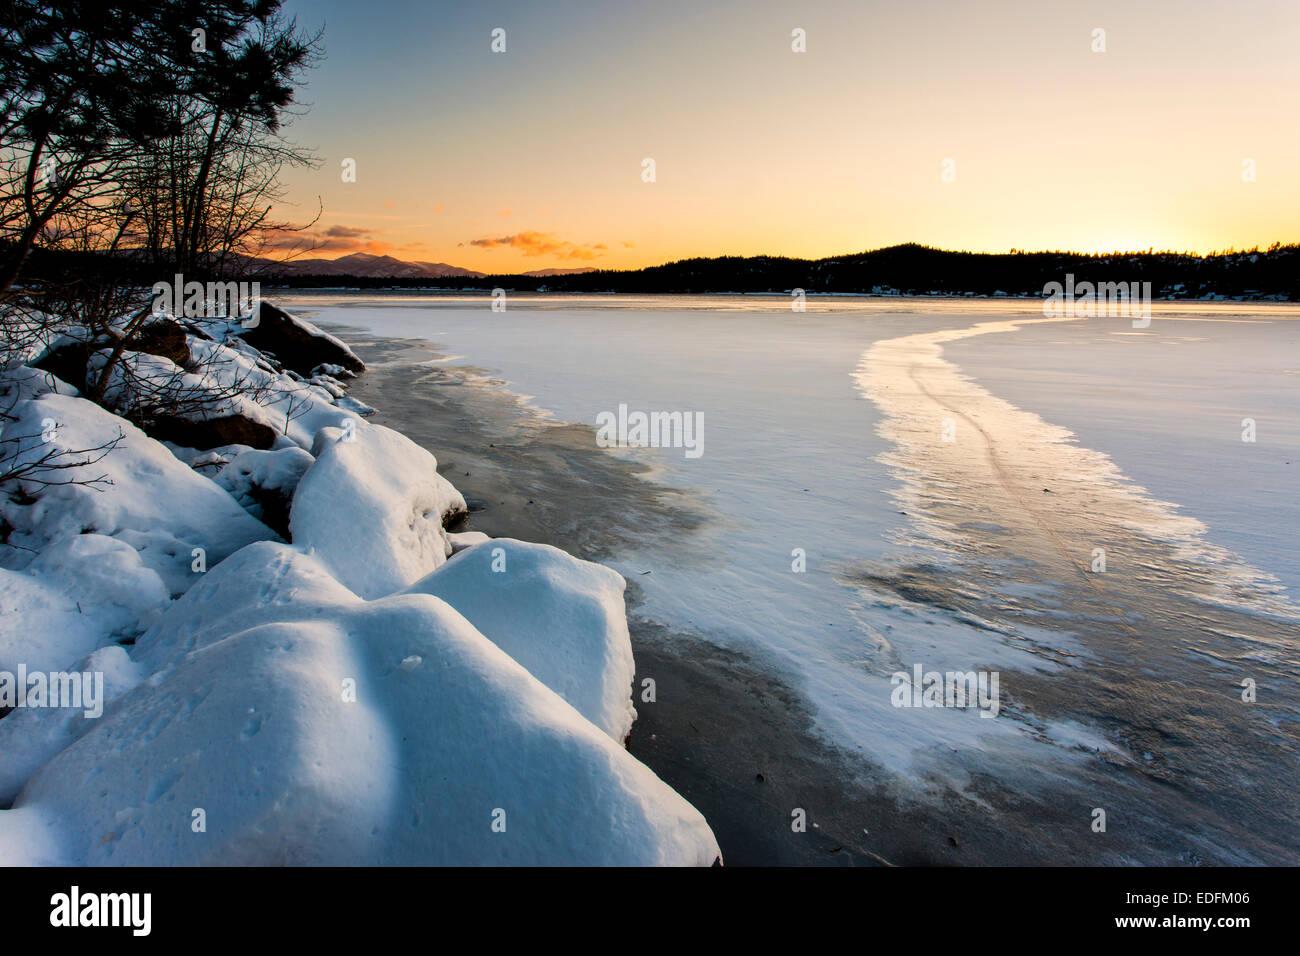 Frozen Lake at sunset. - Stock Image